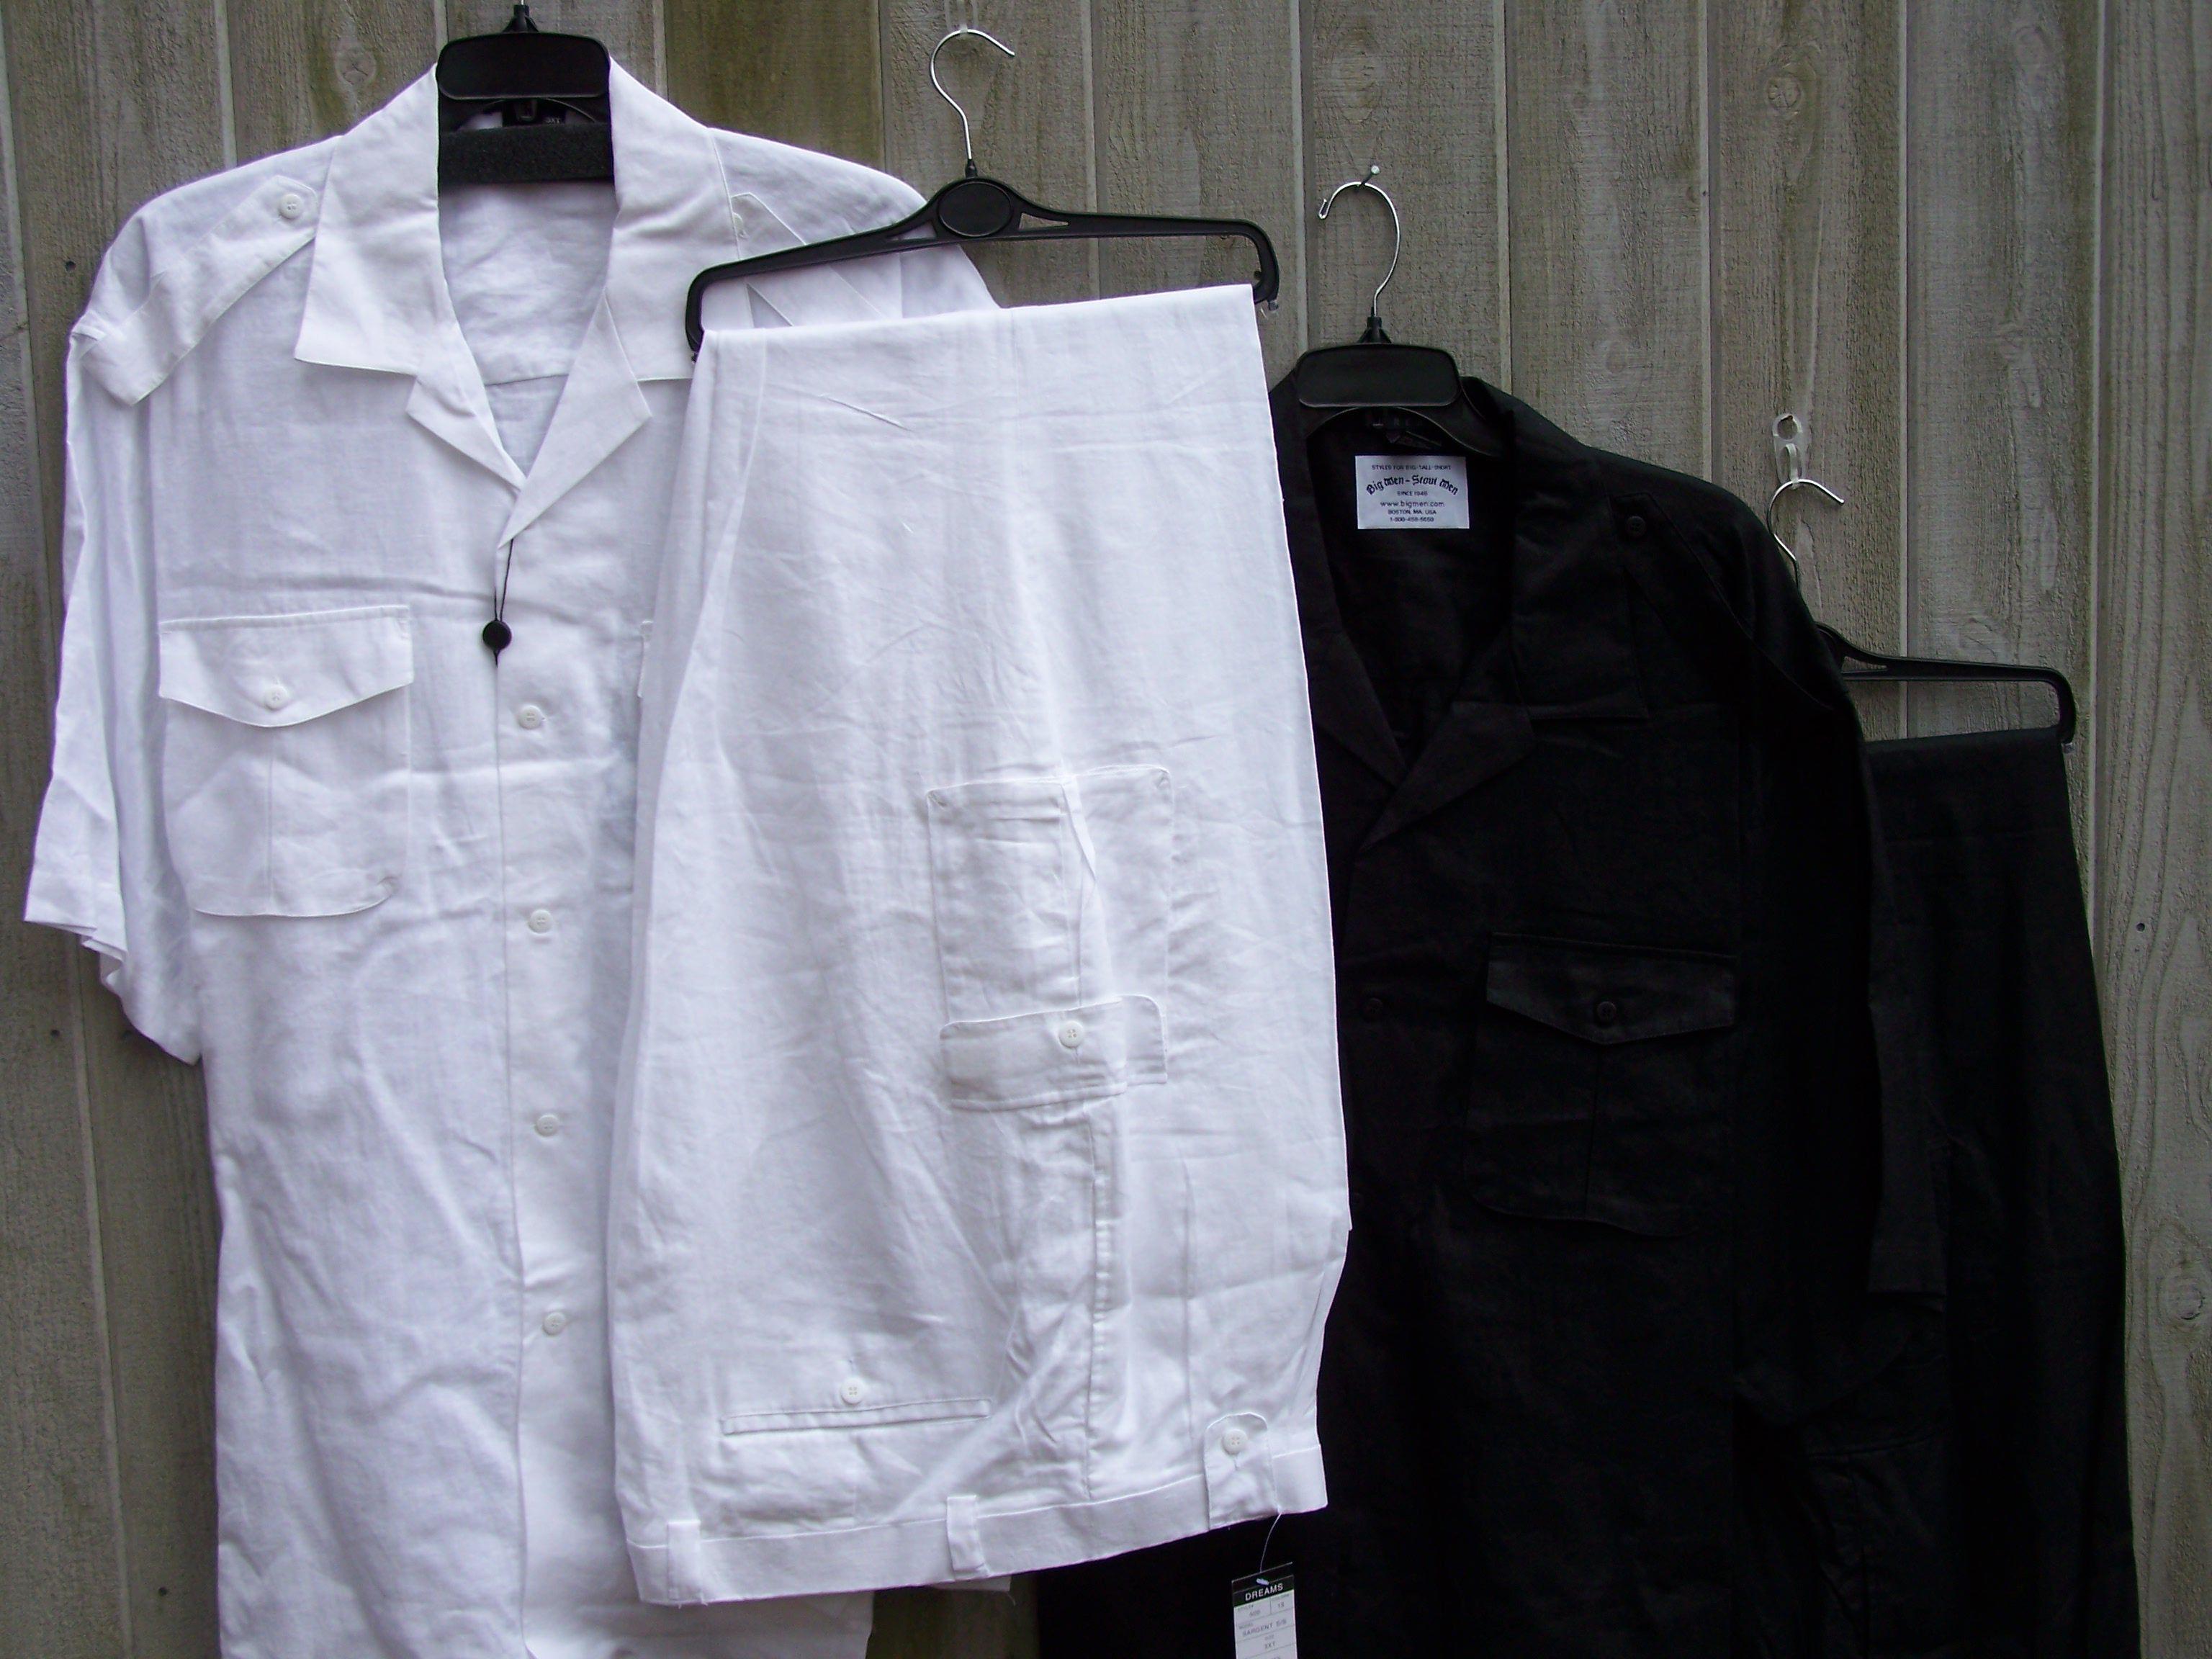 Linen Wear For Men Casual Linen Outfits For Men Suits